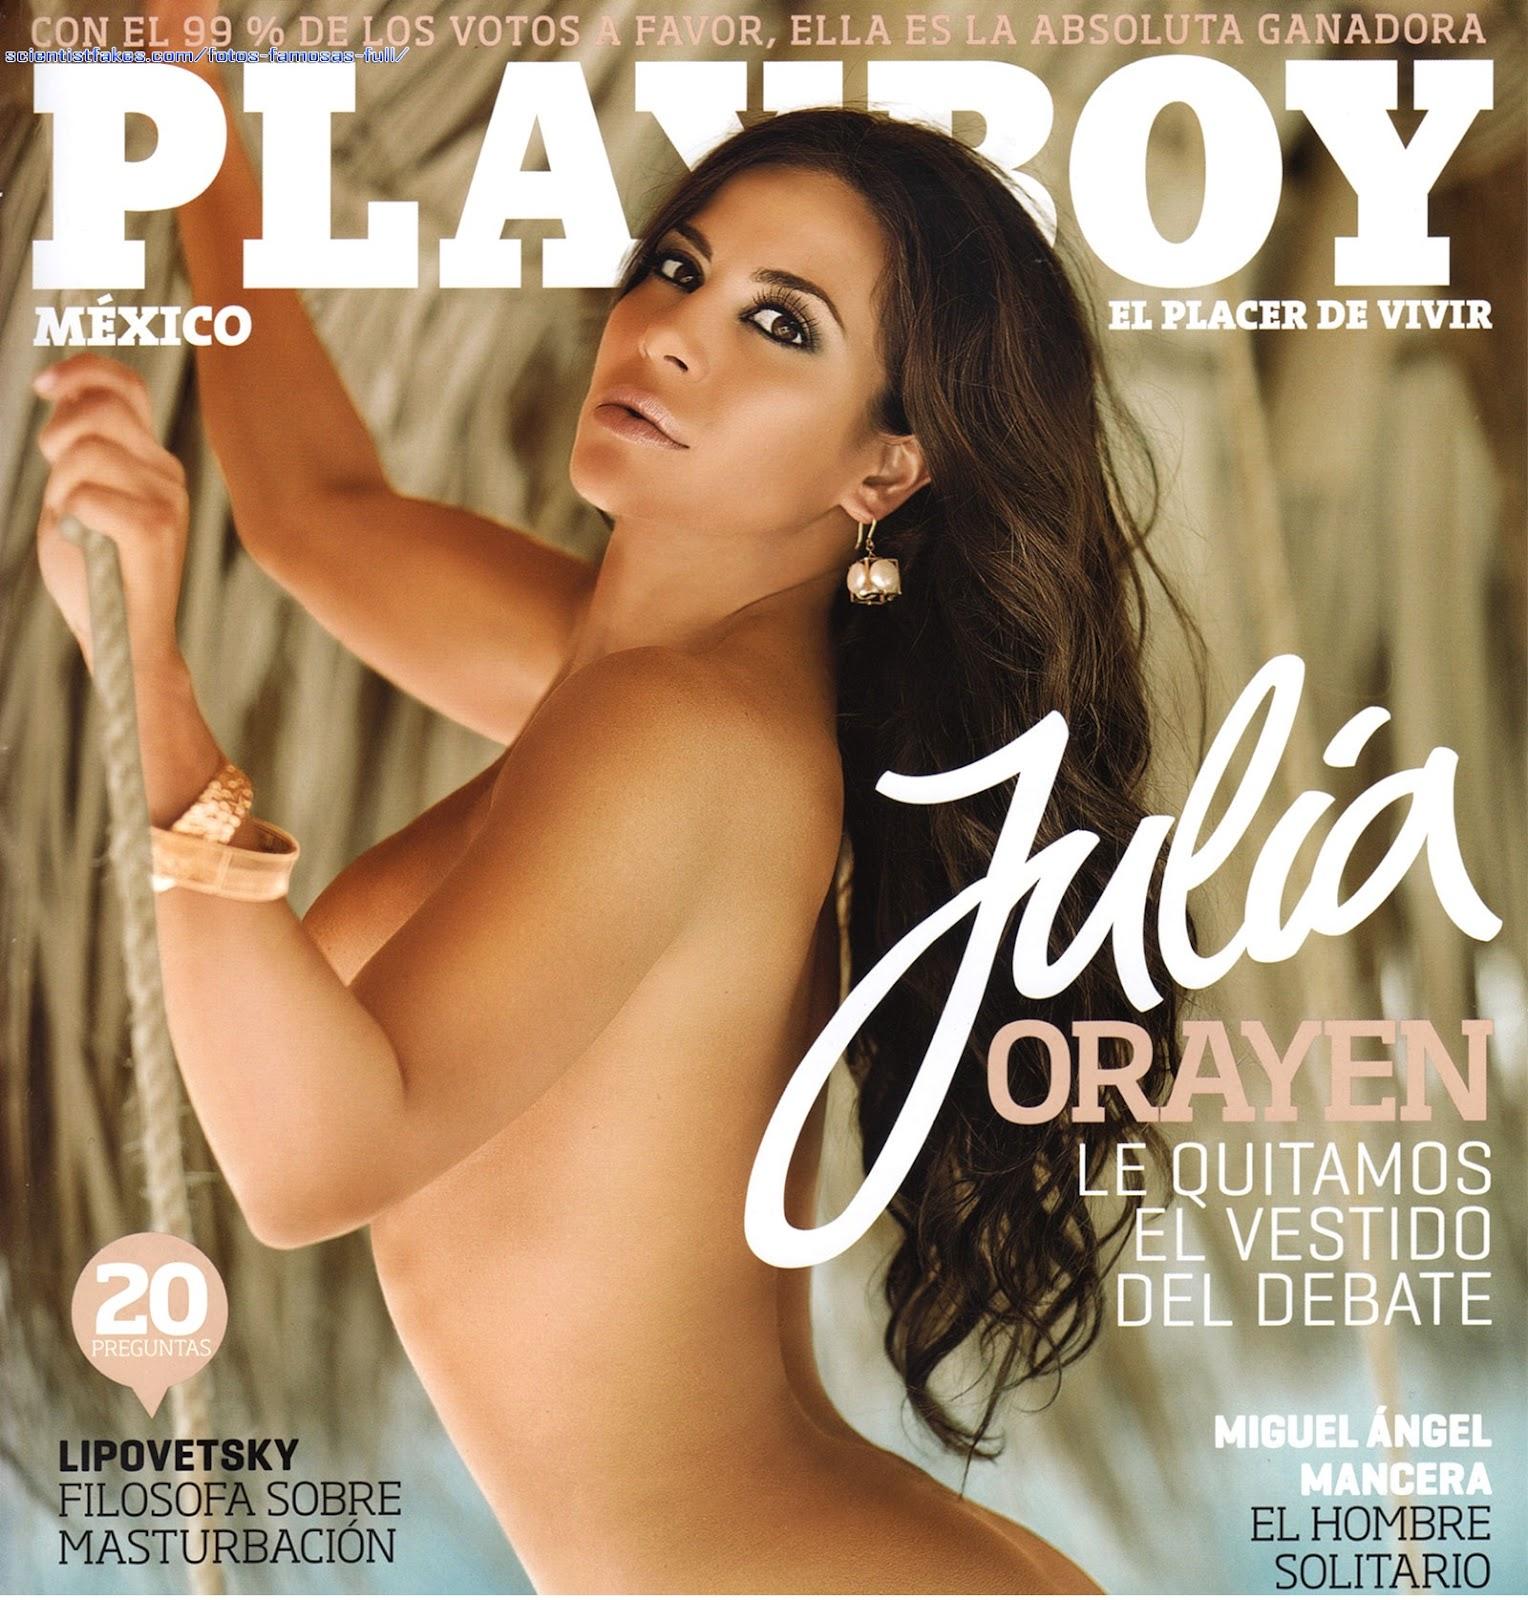 Playboy Julio 2012 (6-2012) Mexico, anteriormente poso para playboy